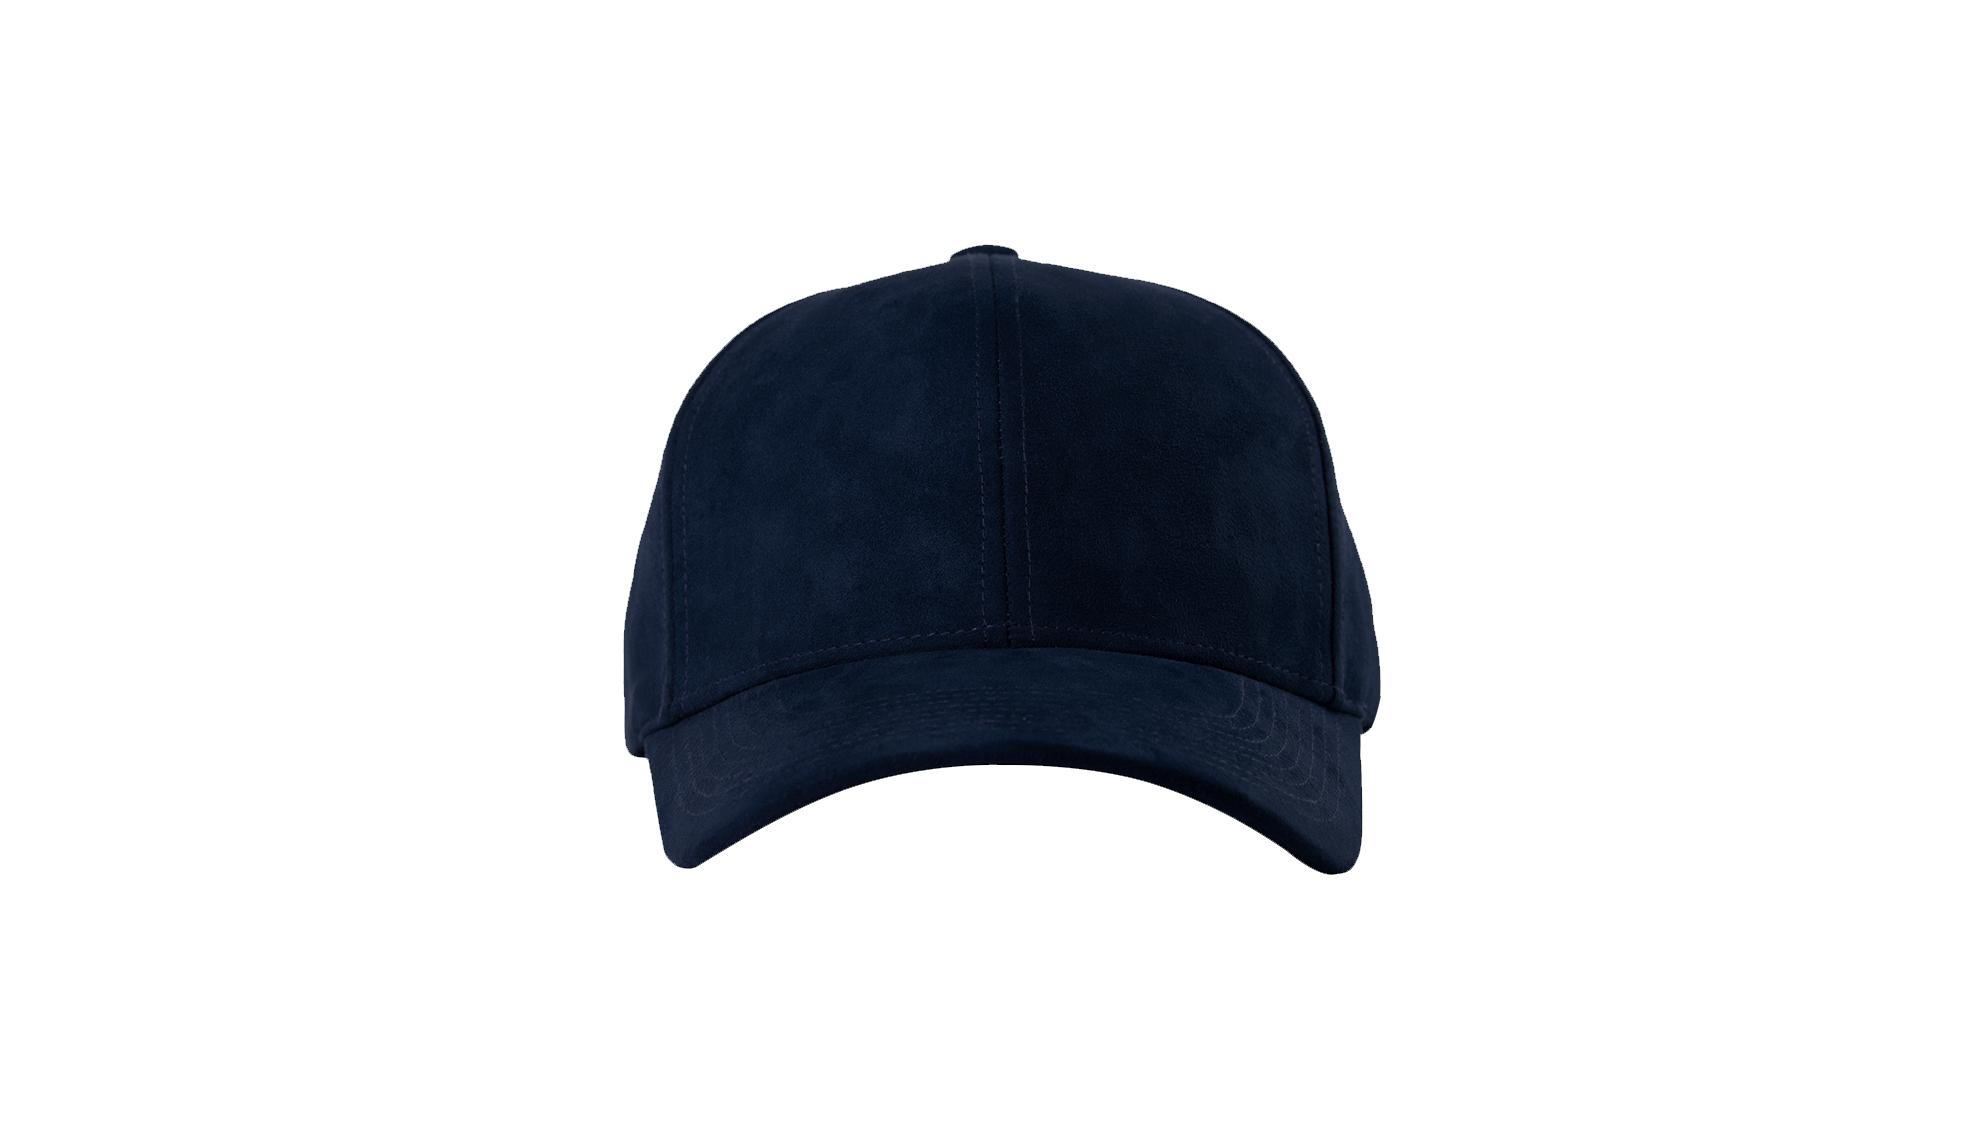 e2a763c7c DSLINE BASEBALL CAP NAVY BLUE SUEDE / GOLD